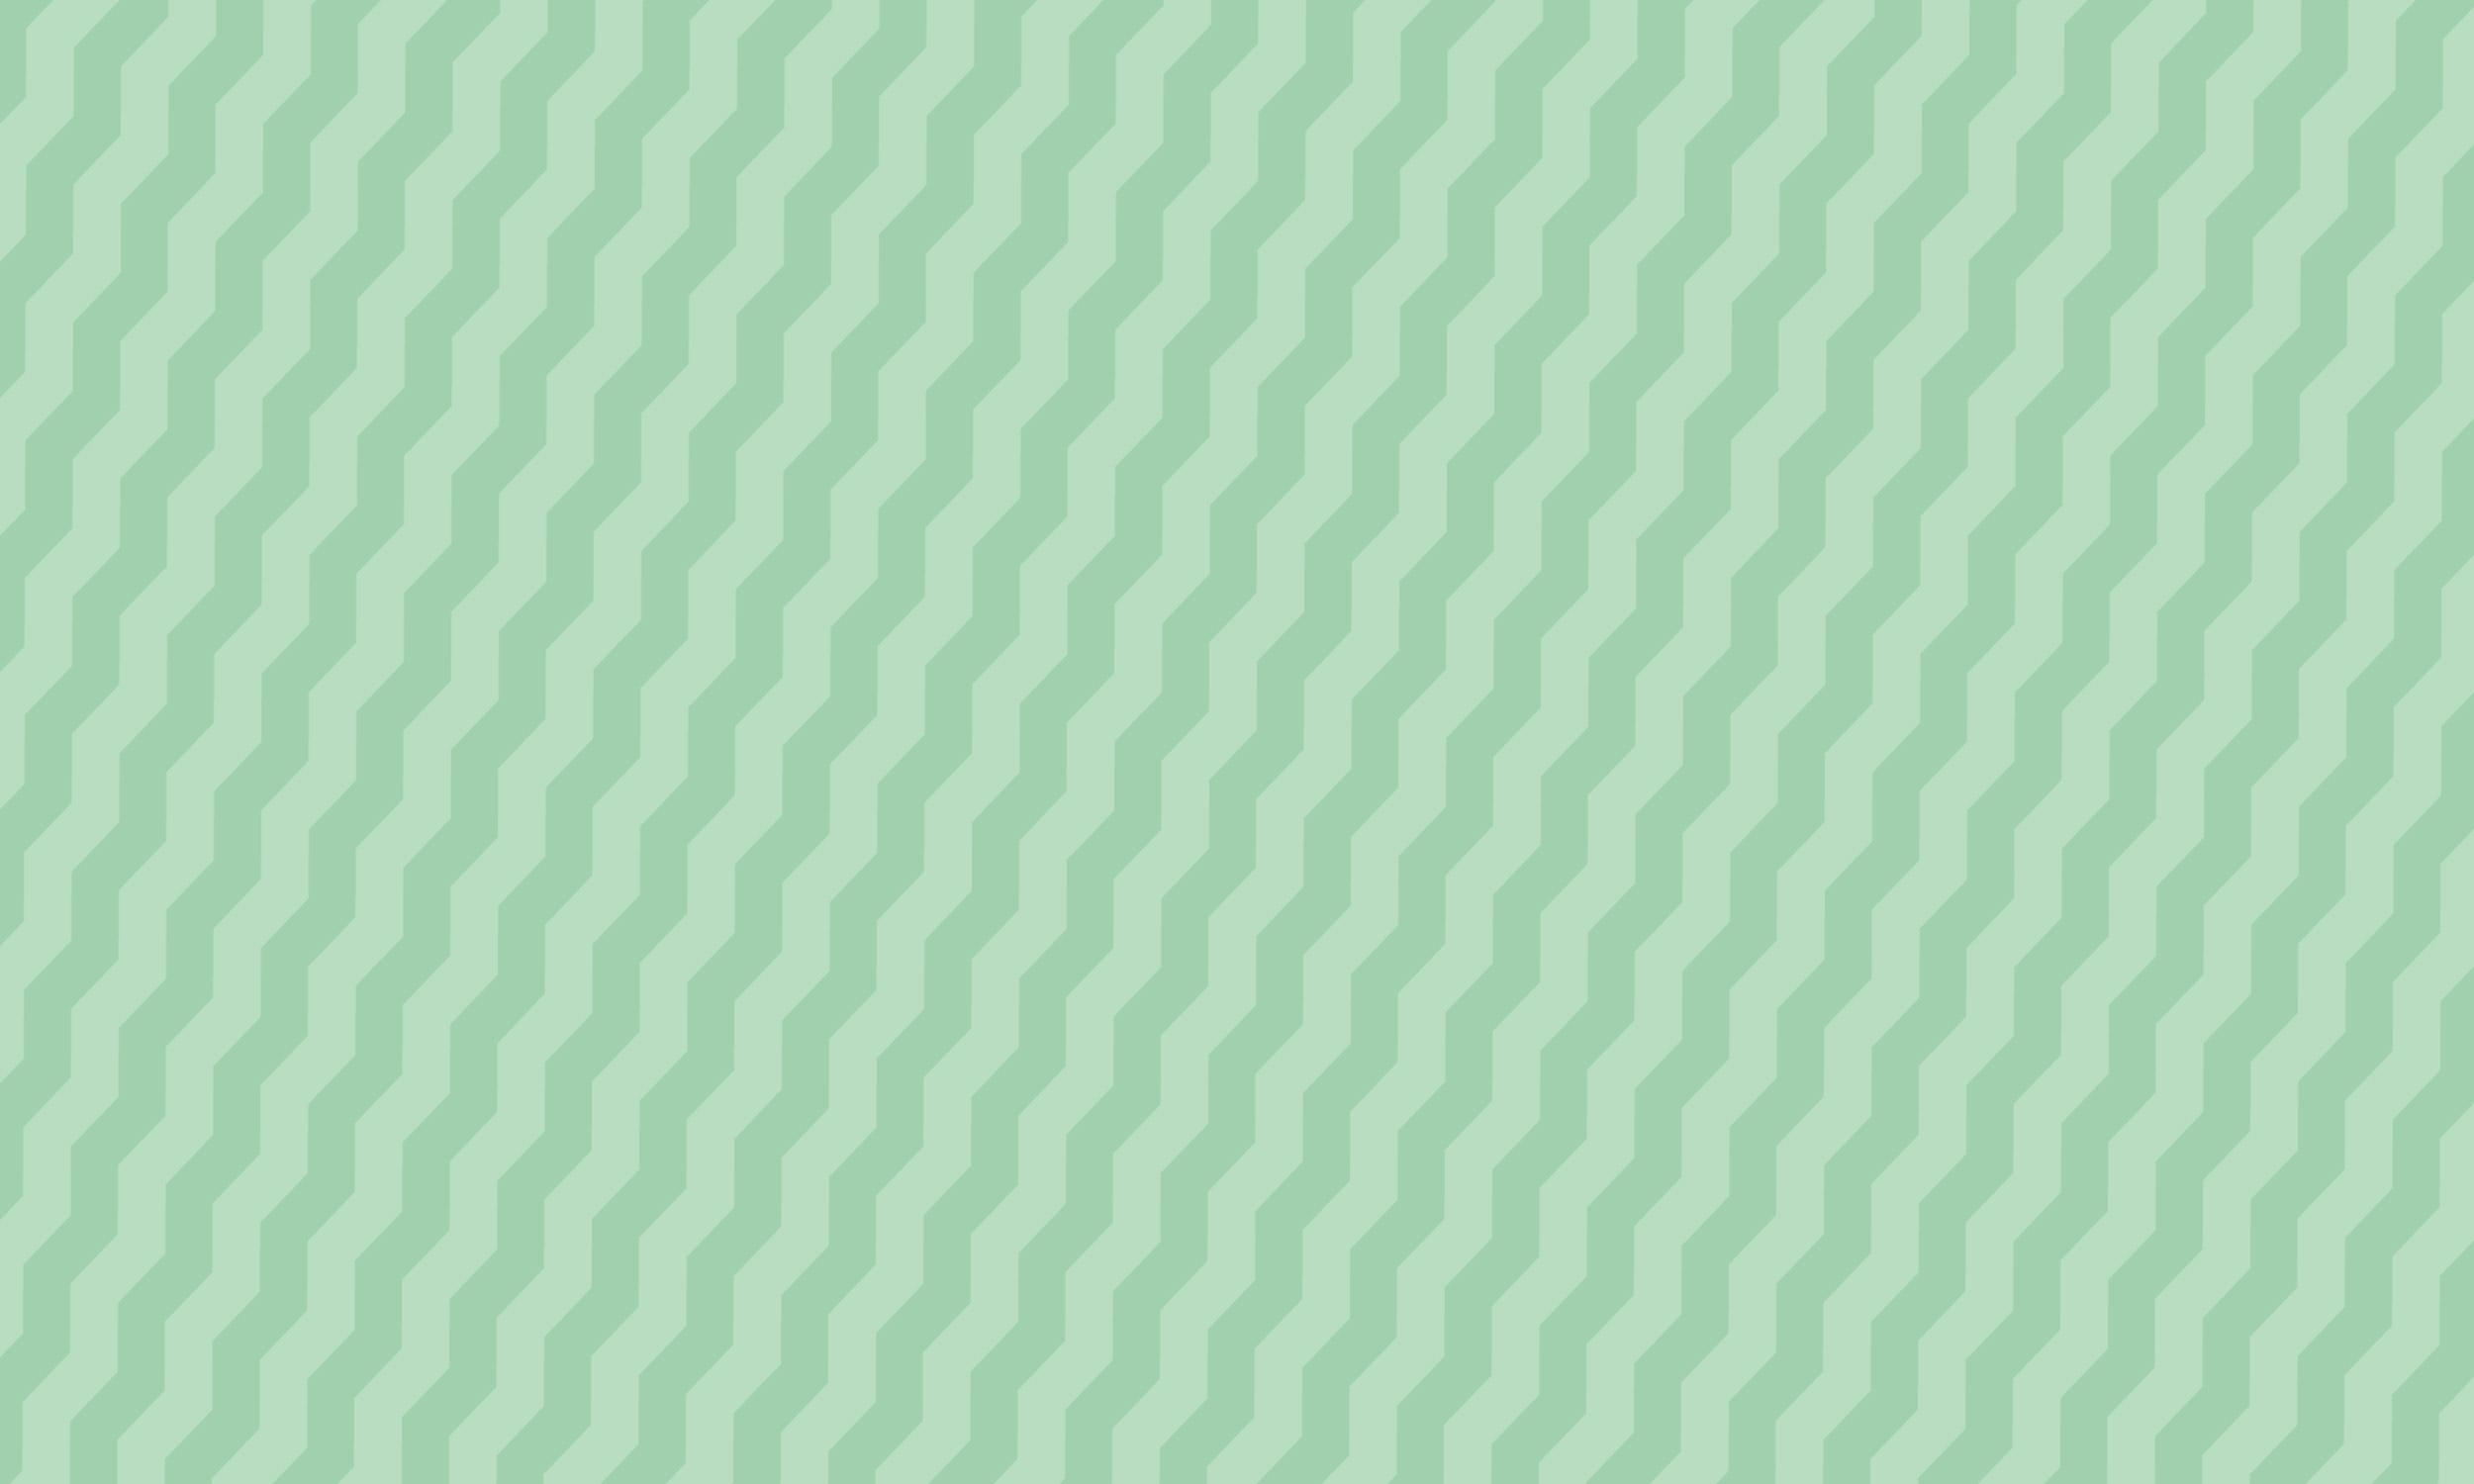 Zig zag mint pattern